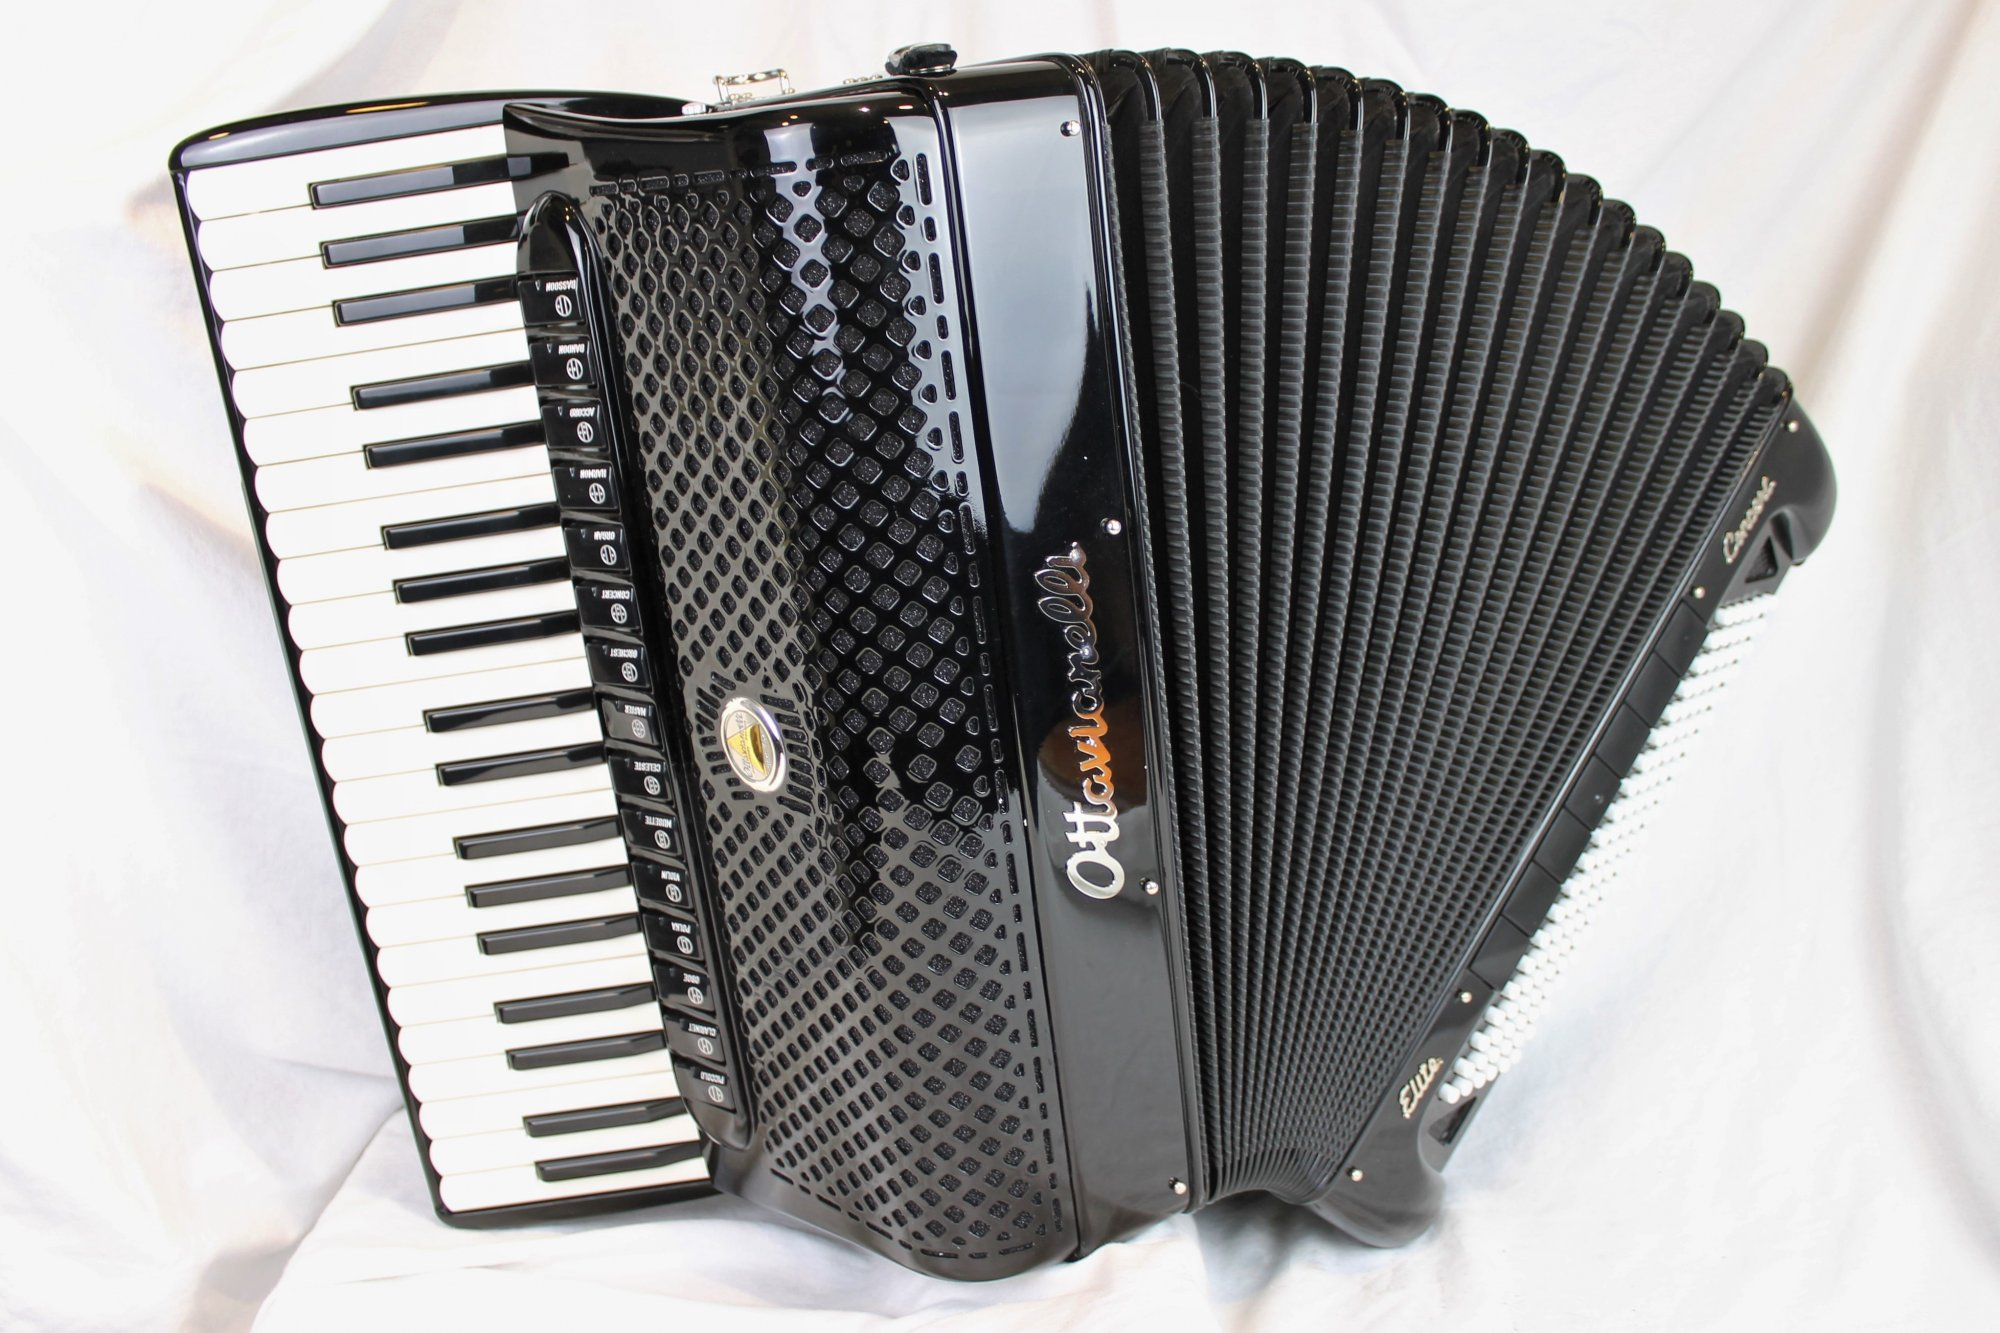 NEW Black Ottavianelli Elite Concert Piano Accordion LMMMH 41 120